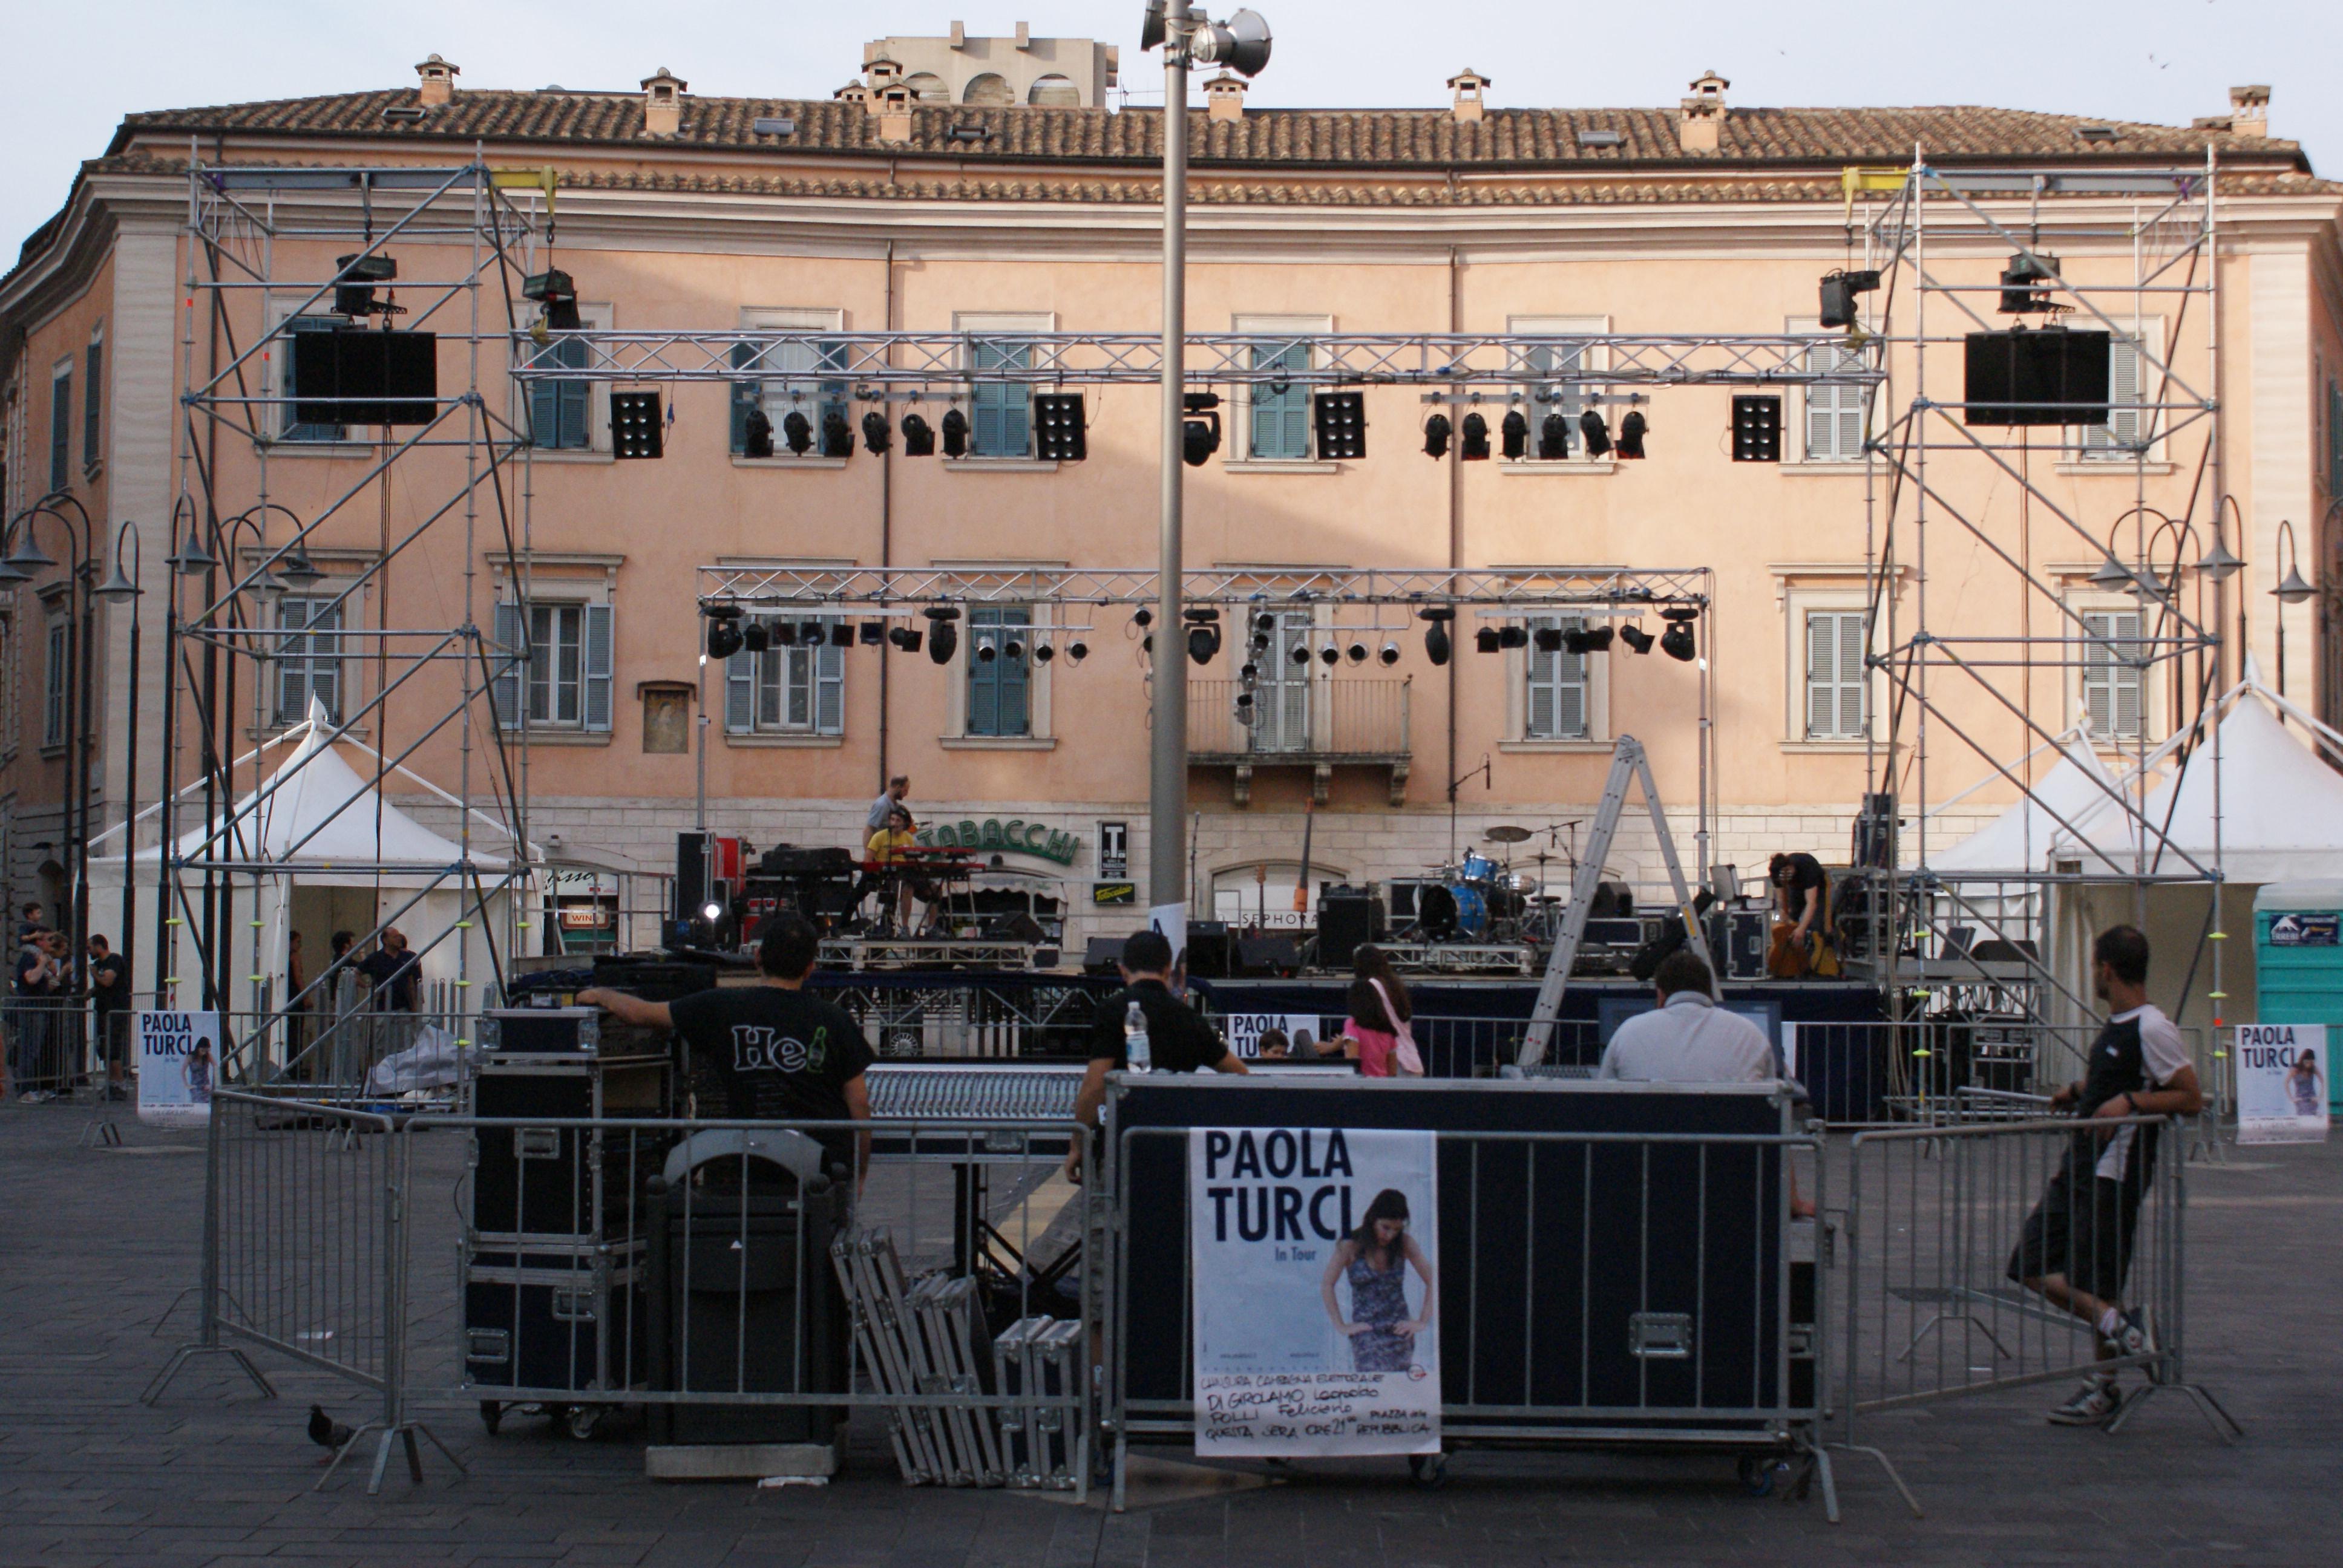 Manifestazioni Varie - Paola Turci